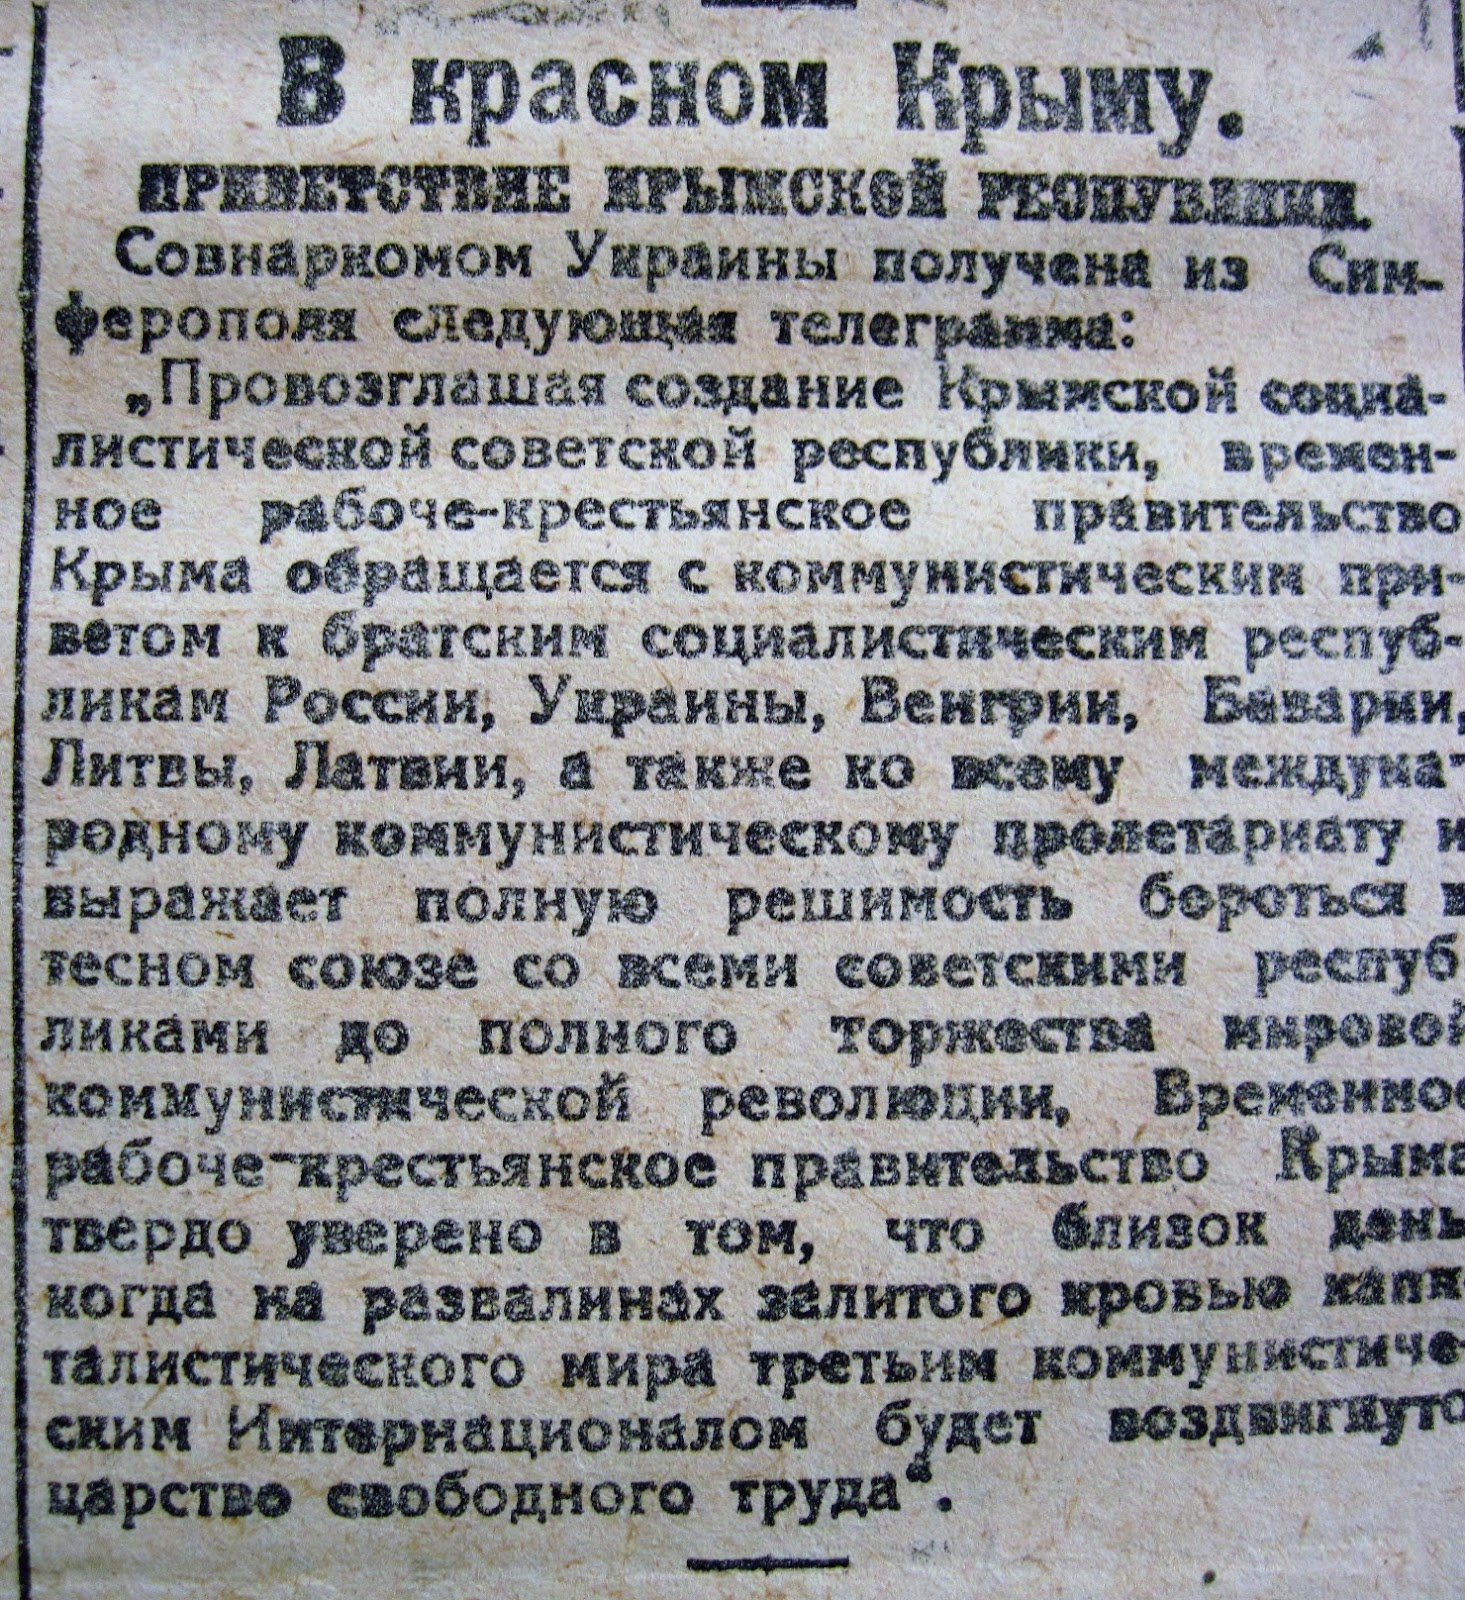 """Коммунист"", Київ, 15 травня 1919-го"